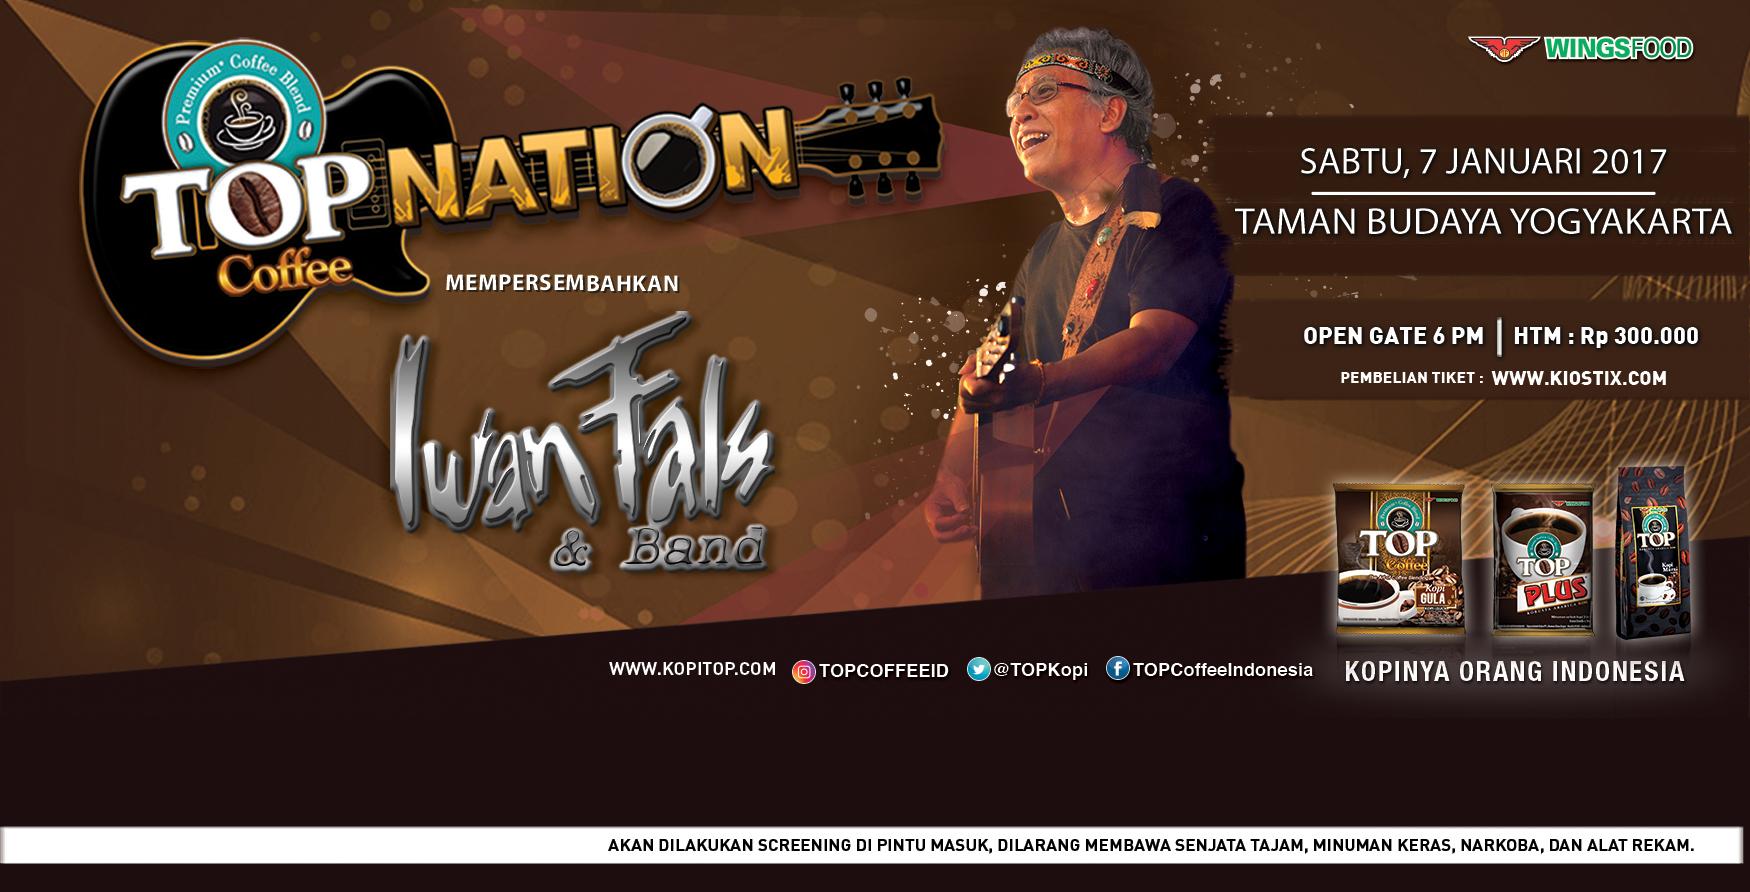 Top Nation Coffee Iwan Fals Concert